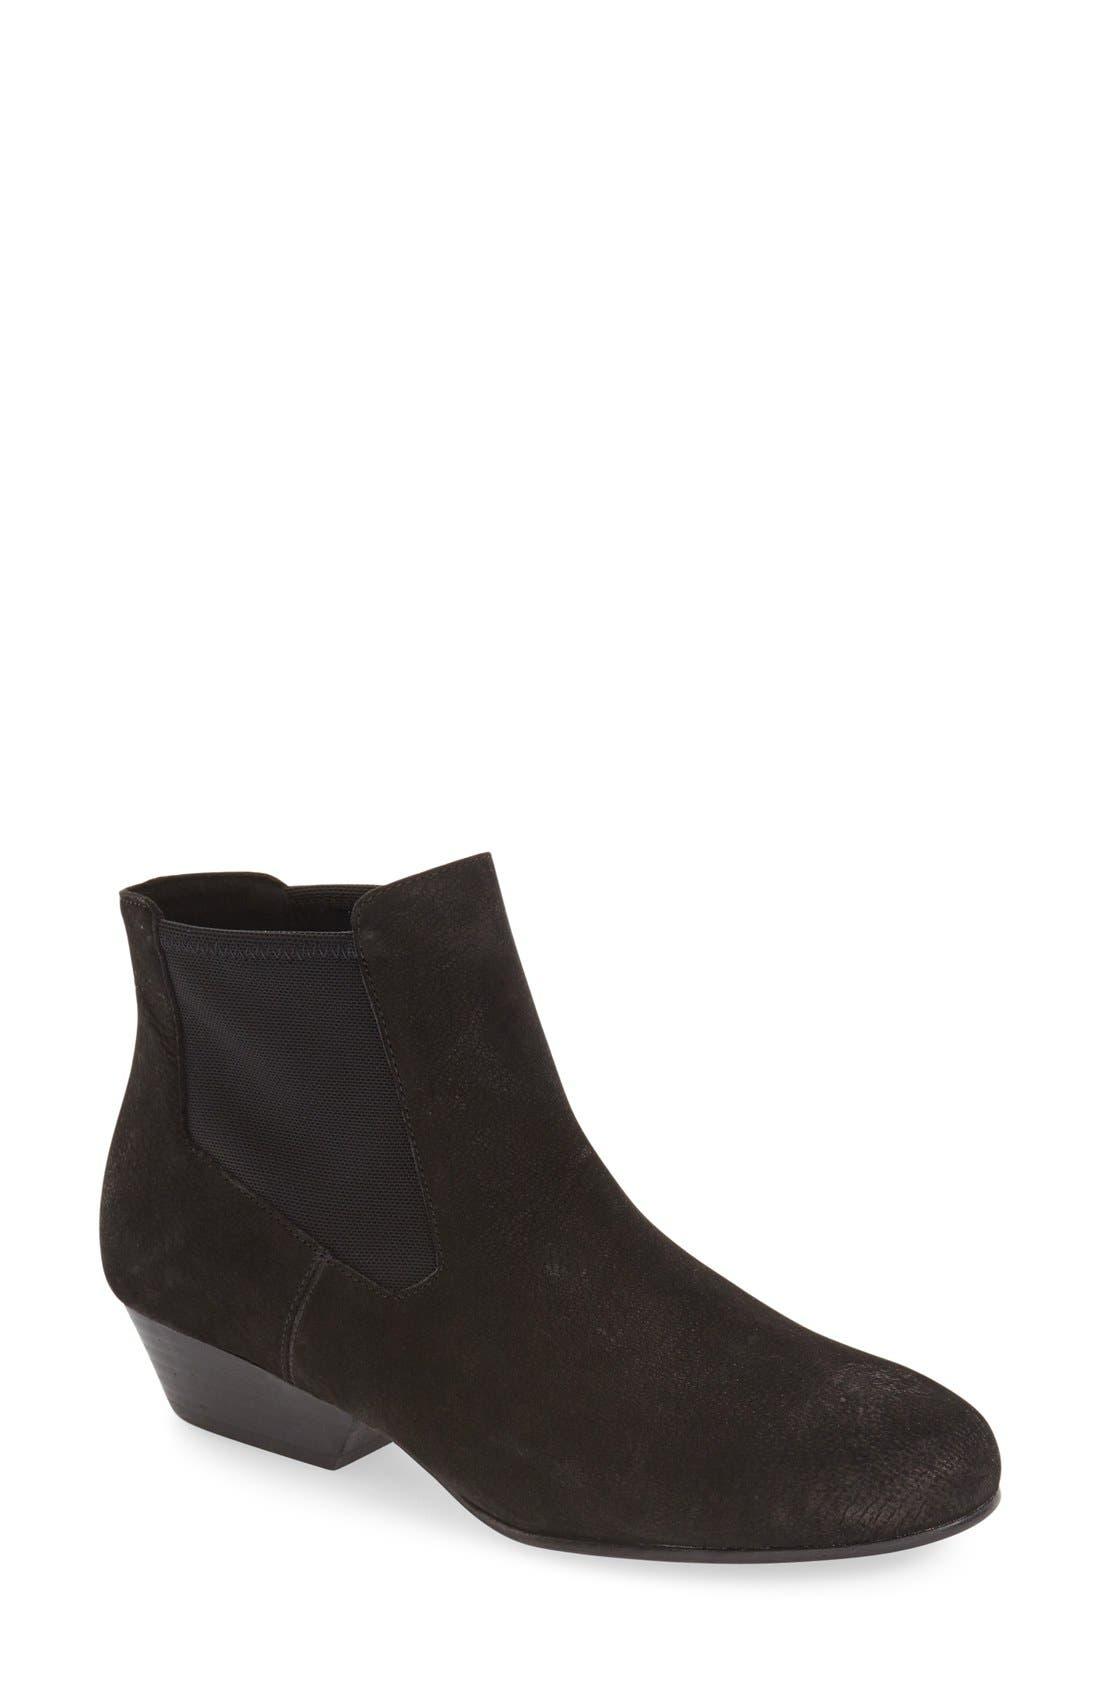 Main Image - Eileen Fisher 'Knack' Chelsea Boot (Women)